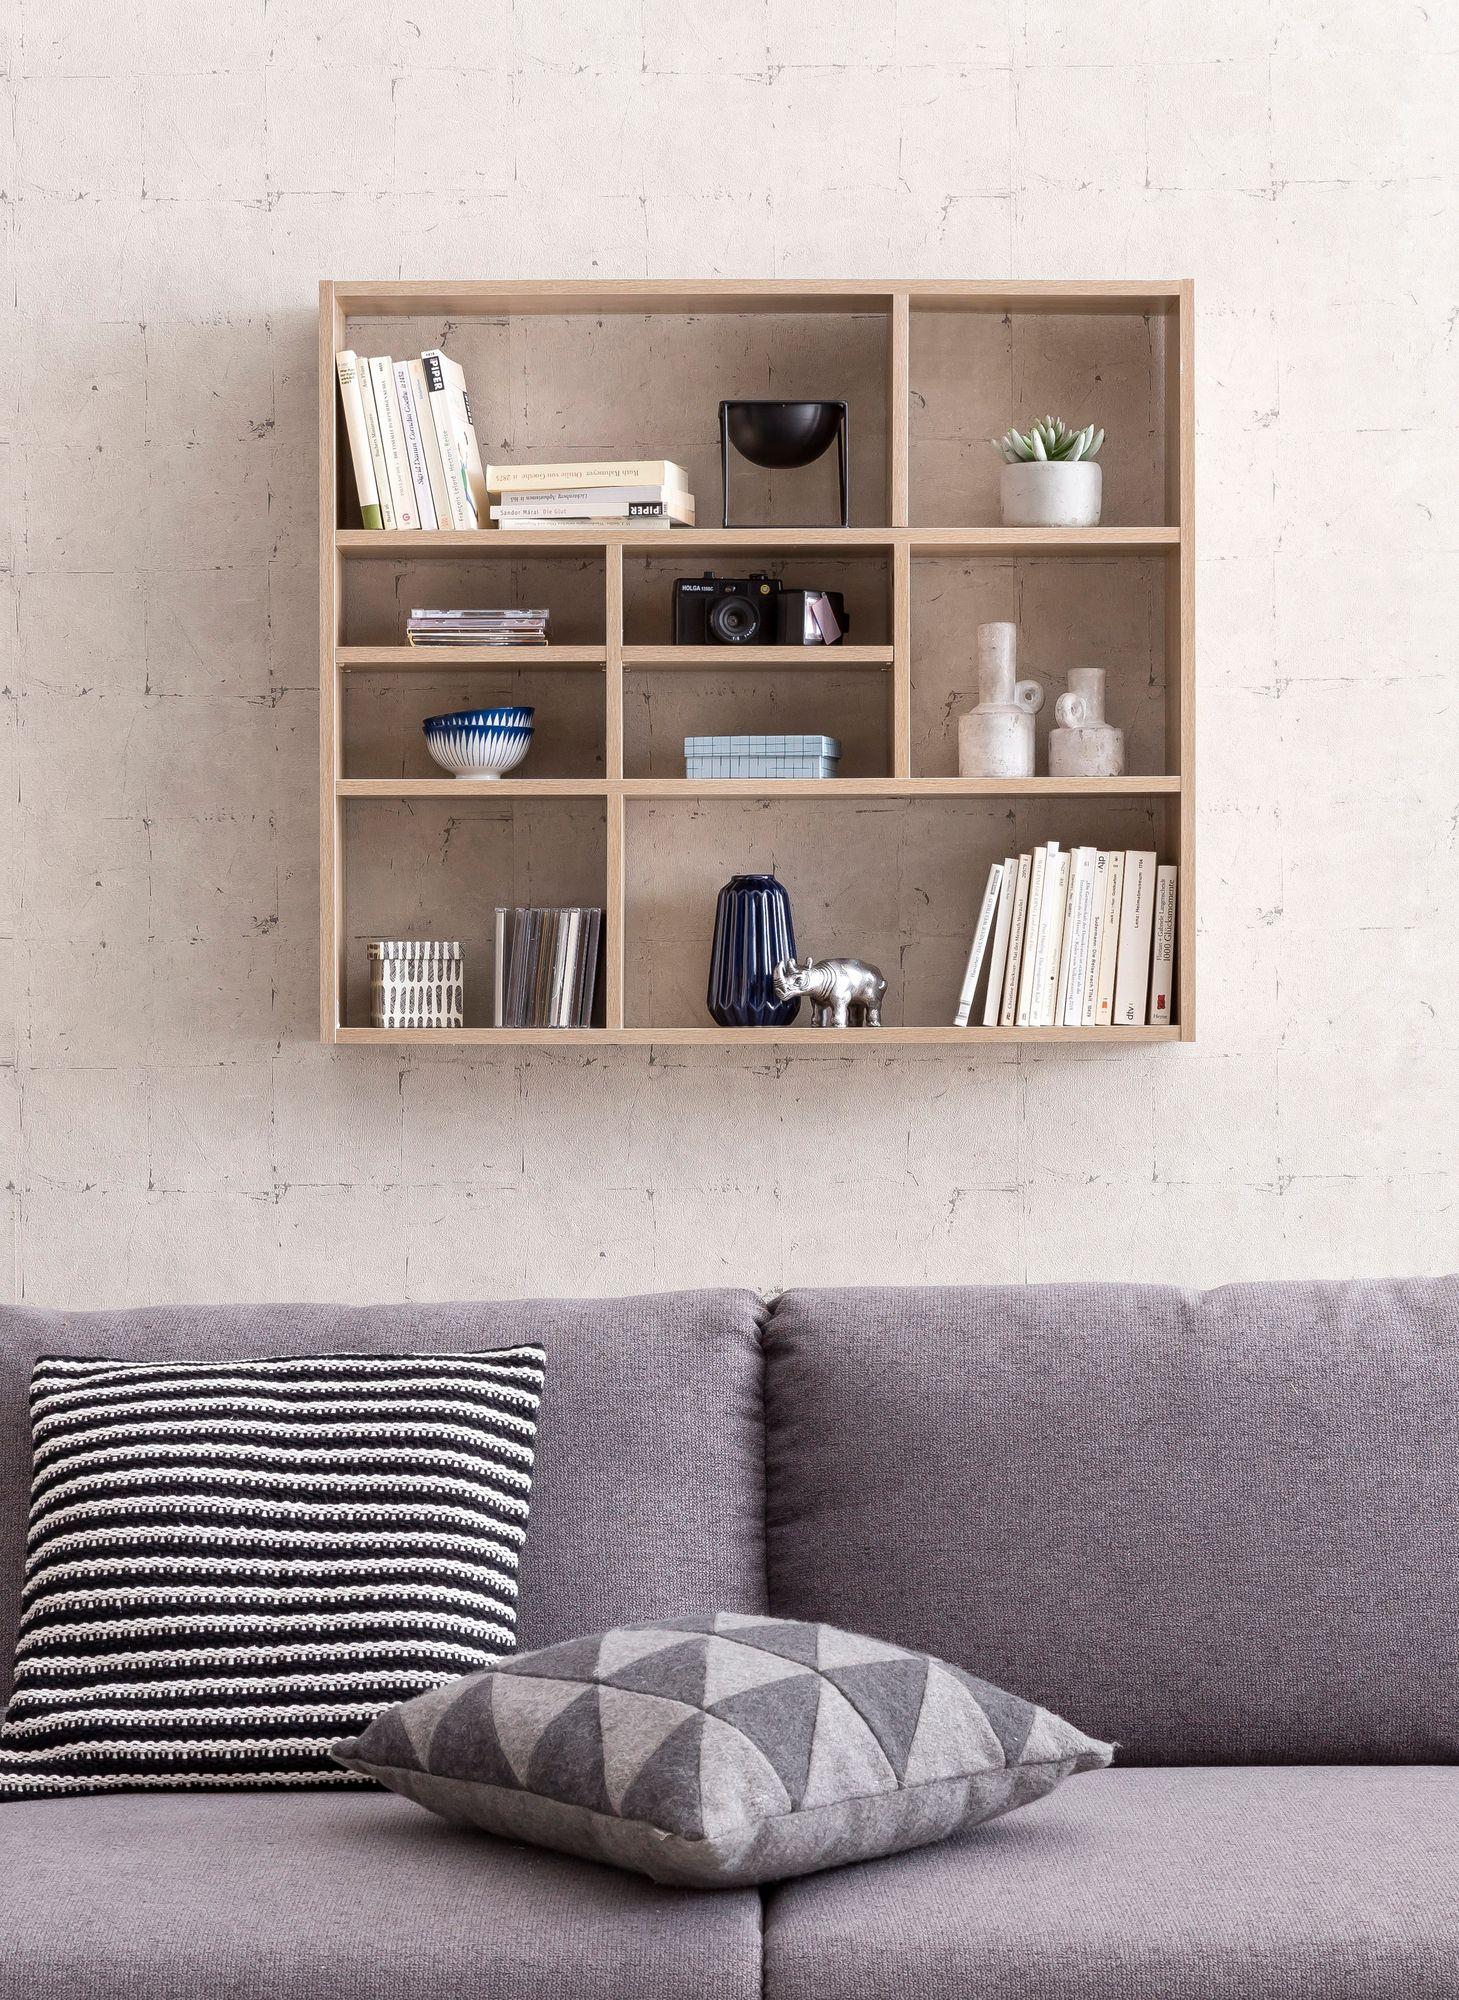 Holz Wandregal Wandboard Retro Deko Regal Bücherregal Hängeregal Quadratisch